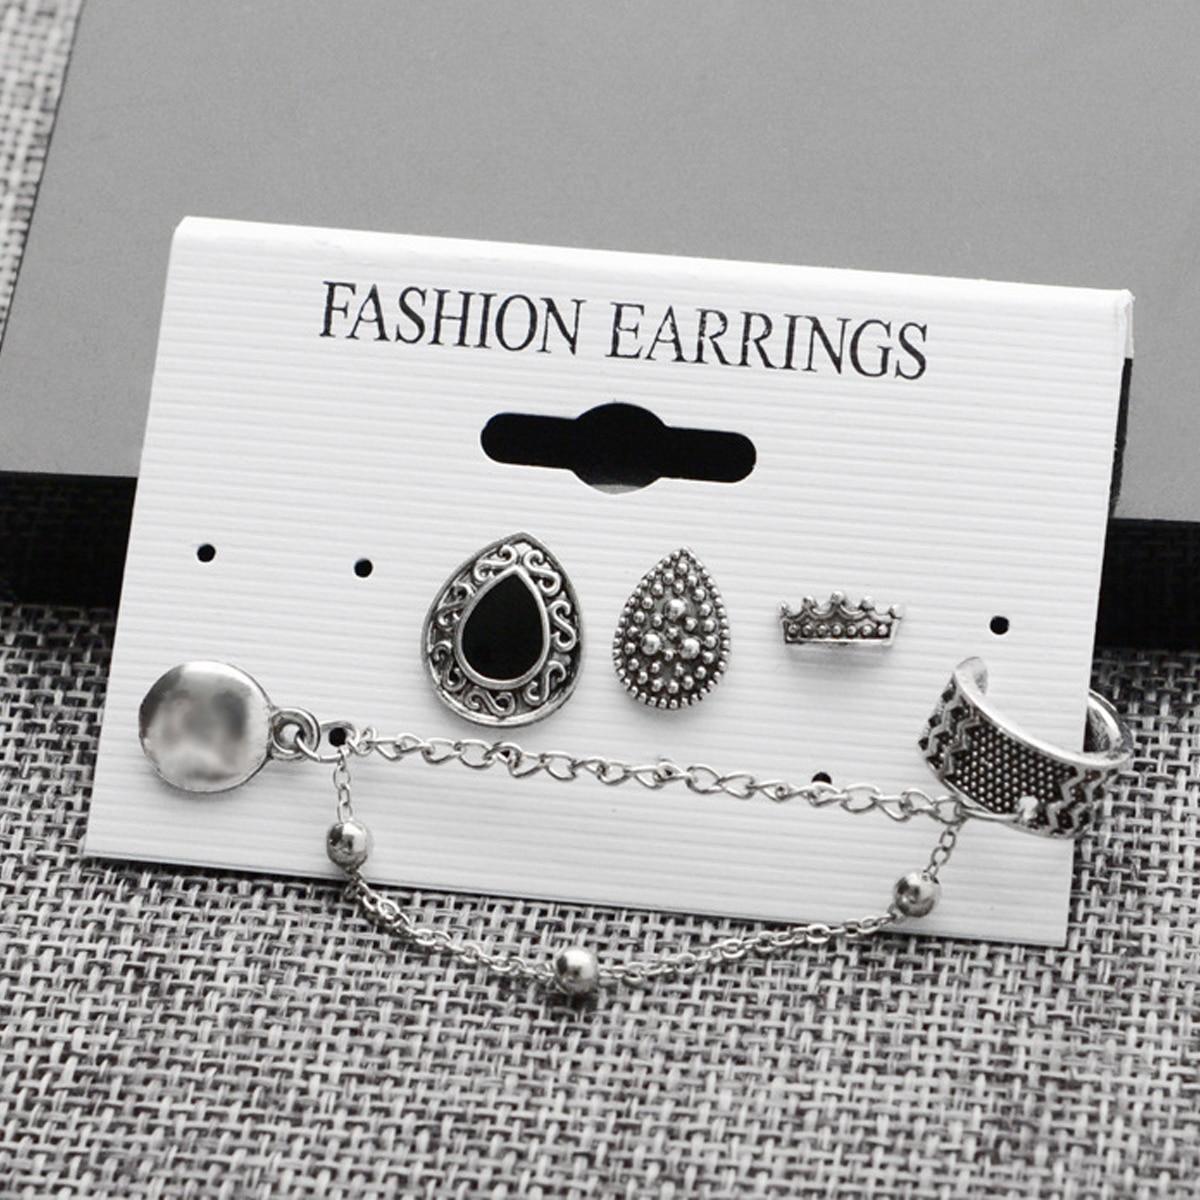 Jewelry Findings & Components Bohemian Women Chain Ear Cuff Clip Stud Wrap Earring Set Gifts For Women Cartilage Earings